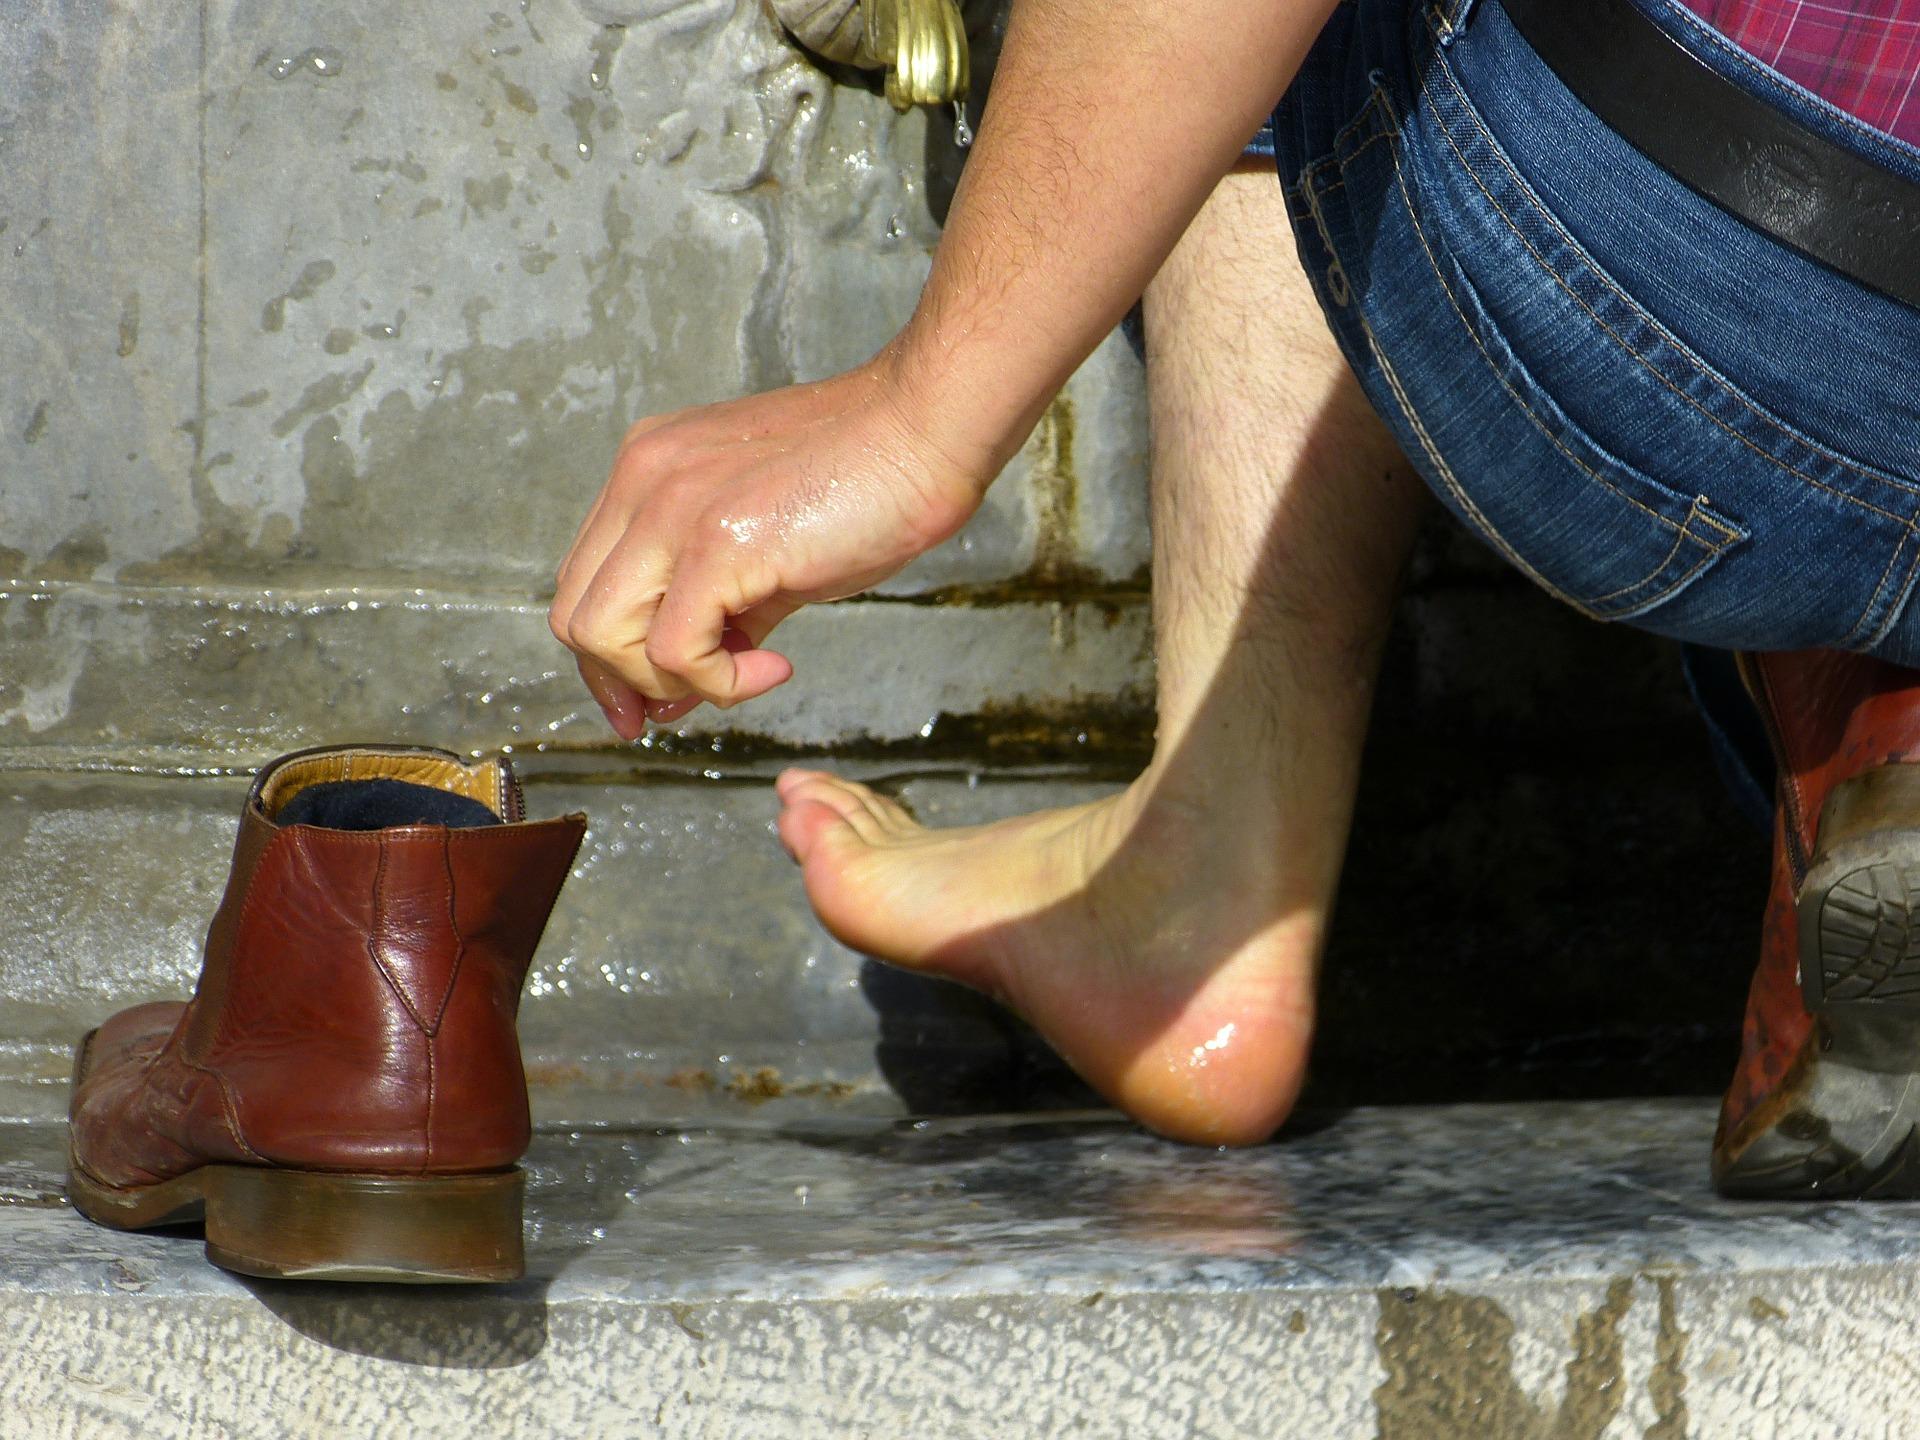 Fußwaschung